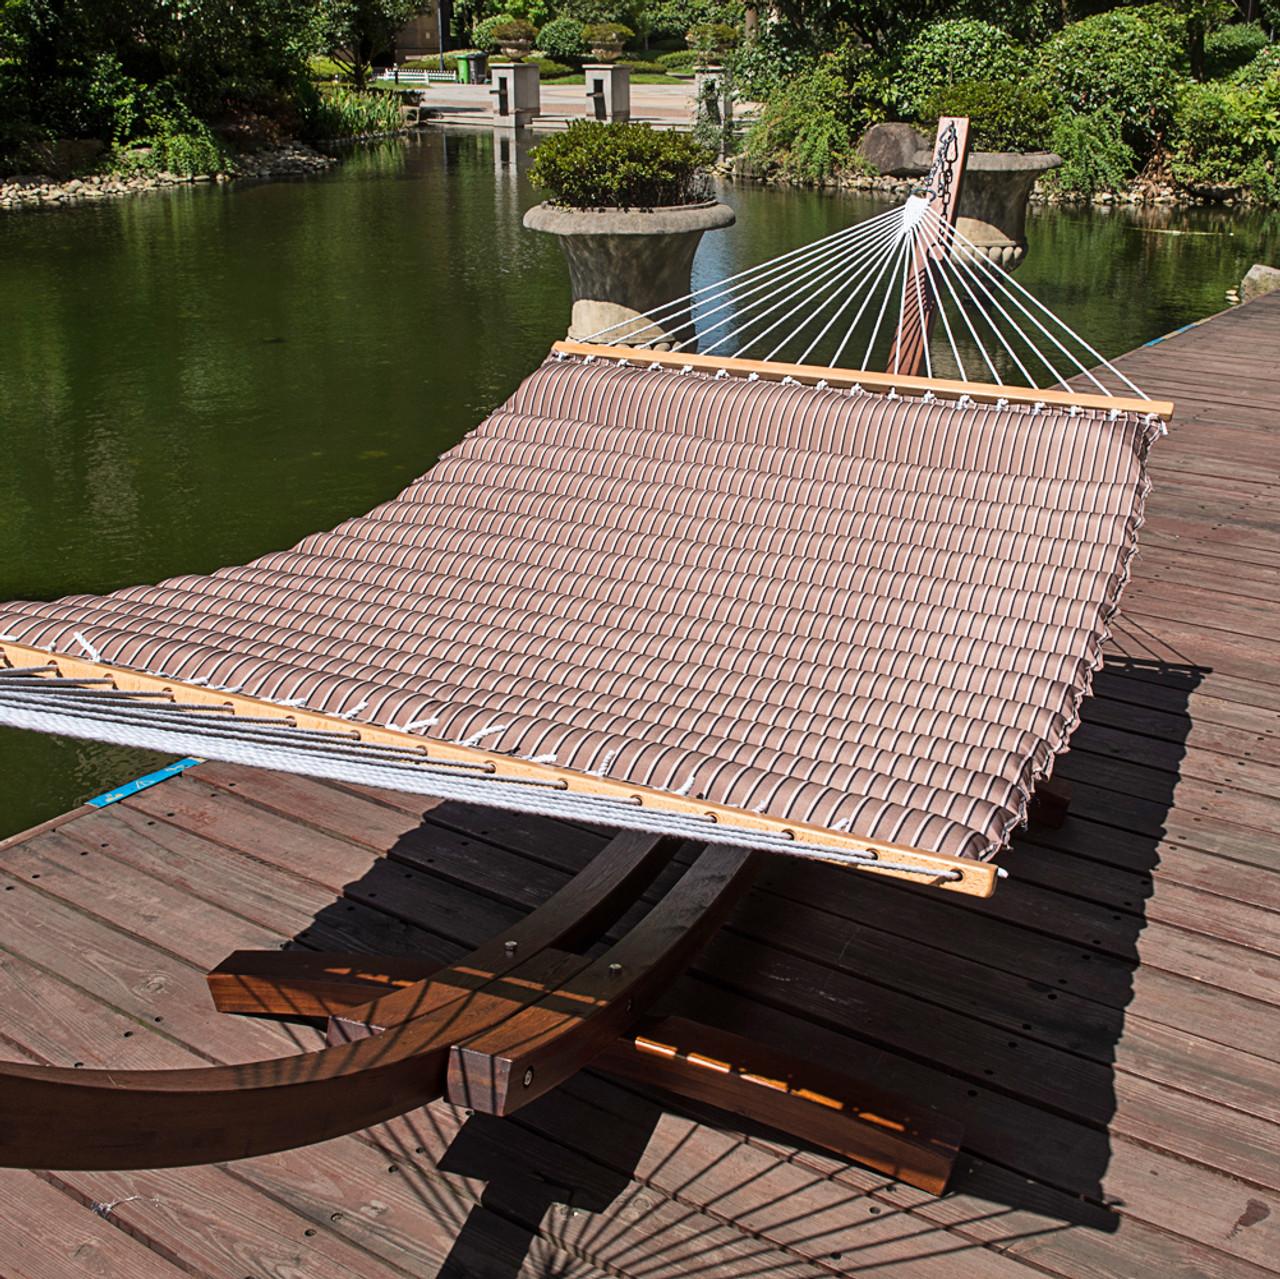 lazy daze hammocks 58 inch double size pillow top hammock swing bed with spreader bar heavy double pillow top hammock  cocoa   rh   sundaleoutdoor